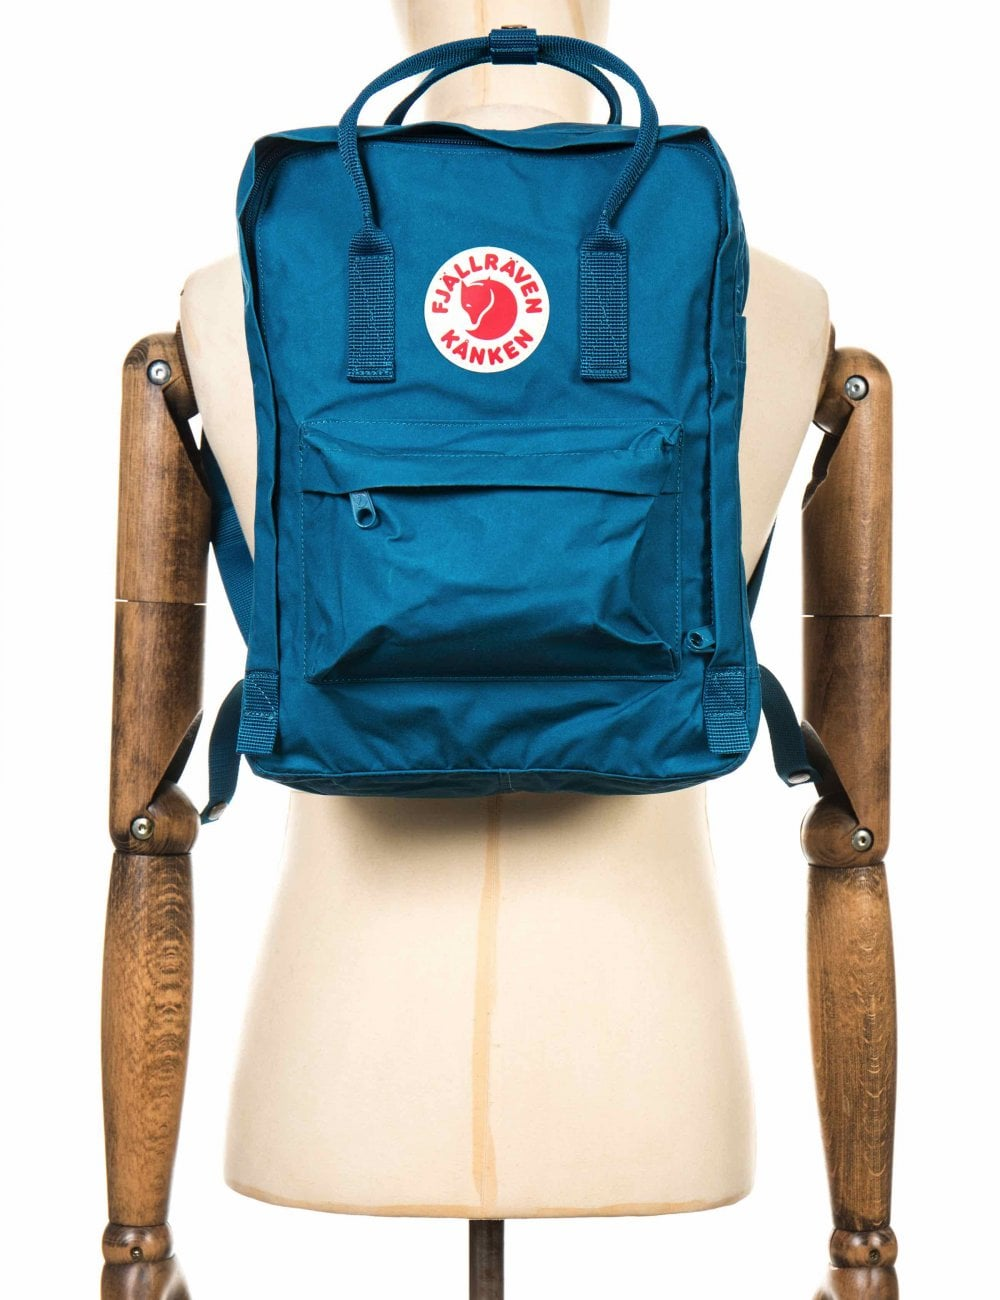 47d955d33027 Fjallraven Kanken Classic Backpack - Glacier Green - Accessories ...